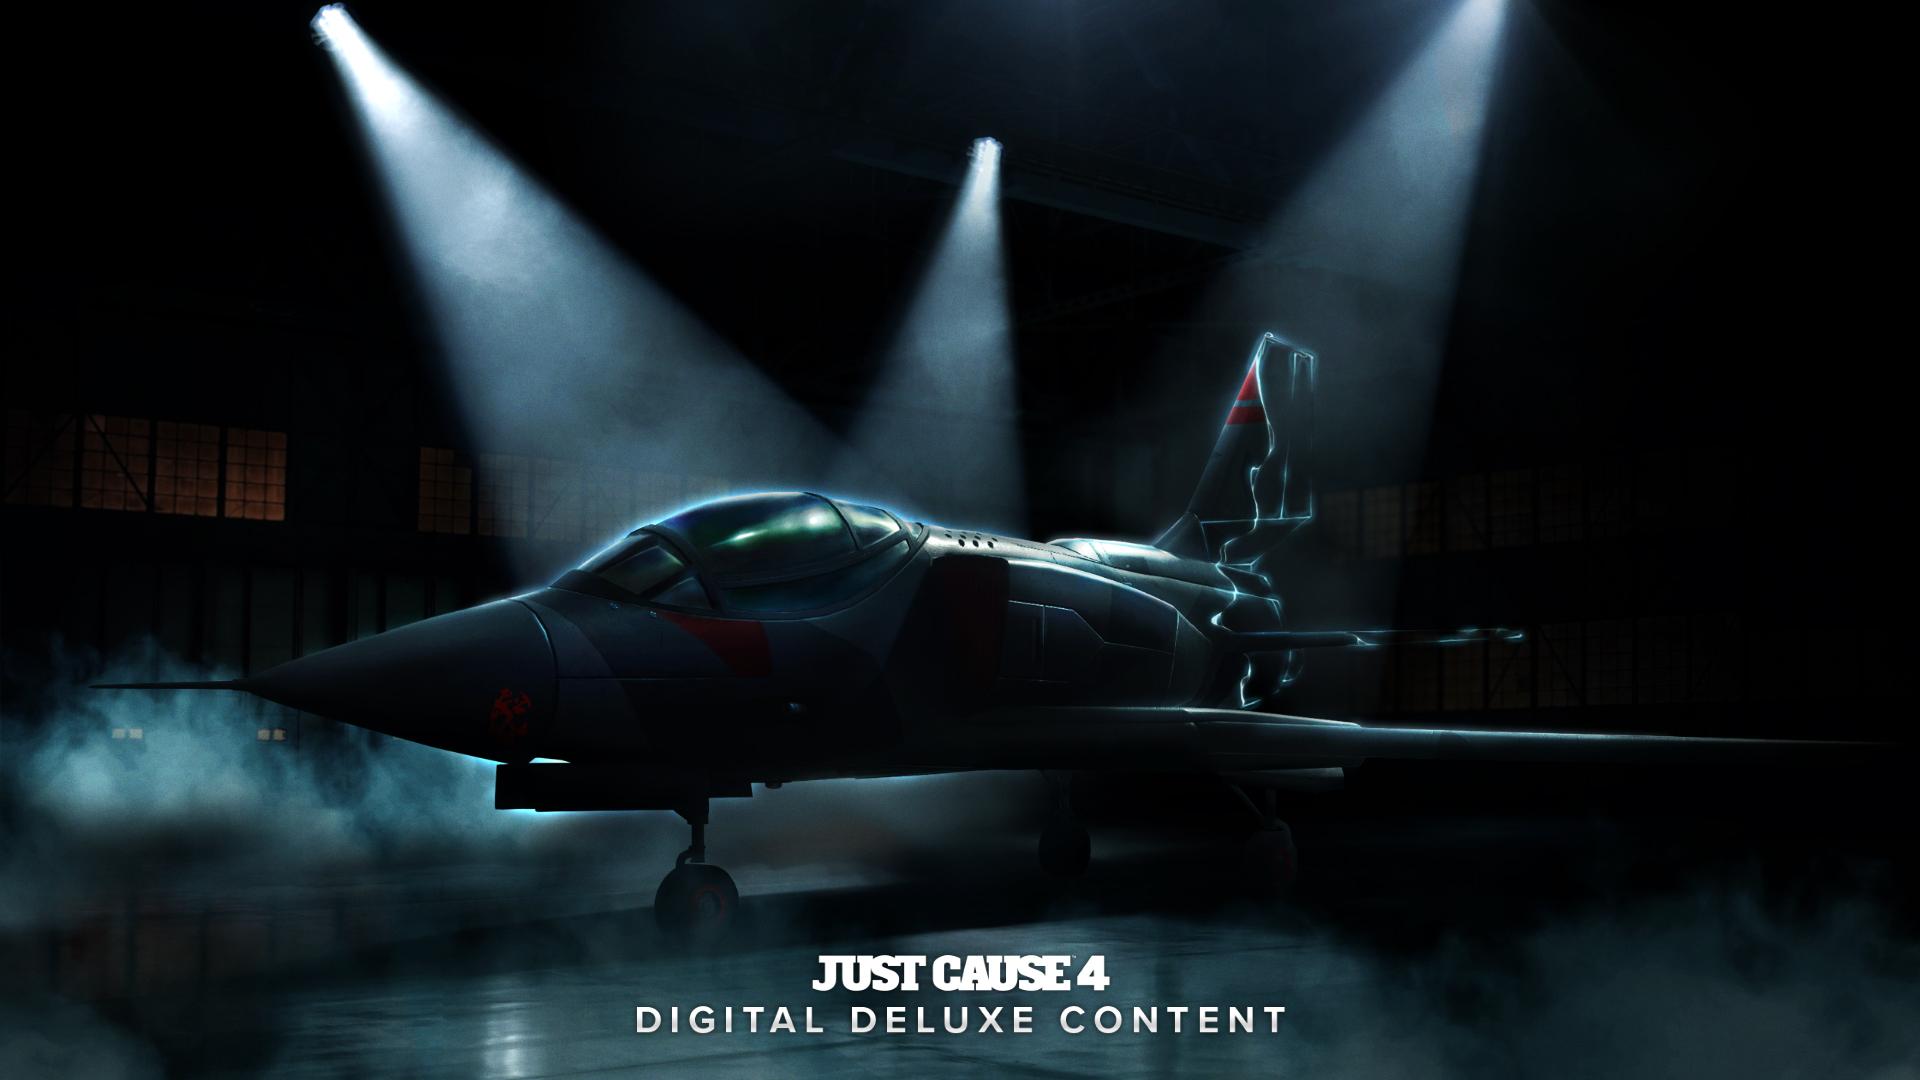 Just Cause 4: Digital Deluxe Content screenshot